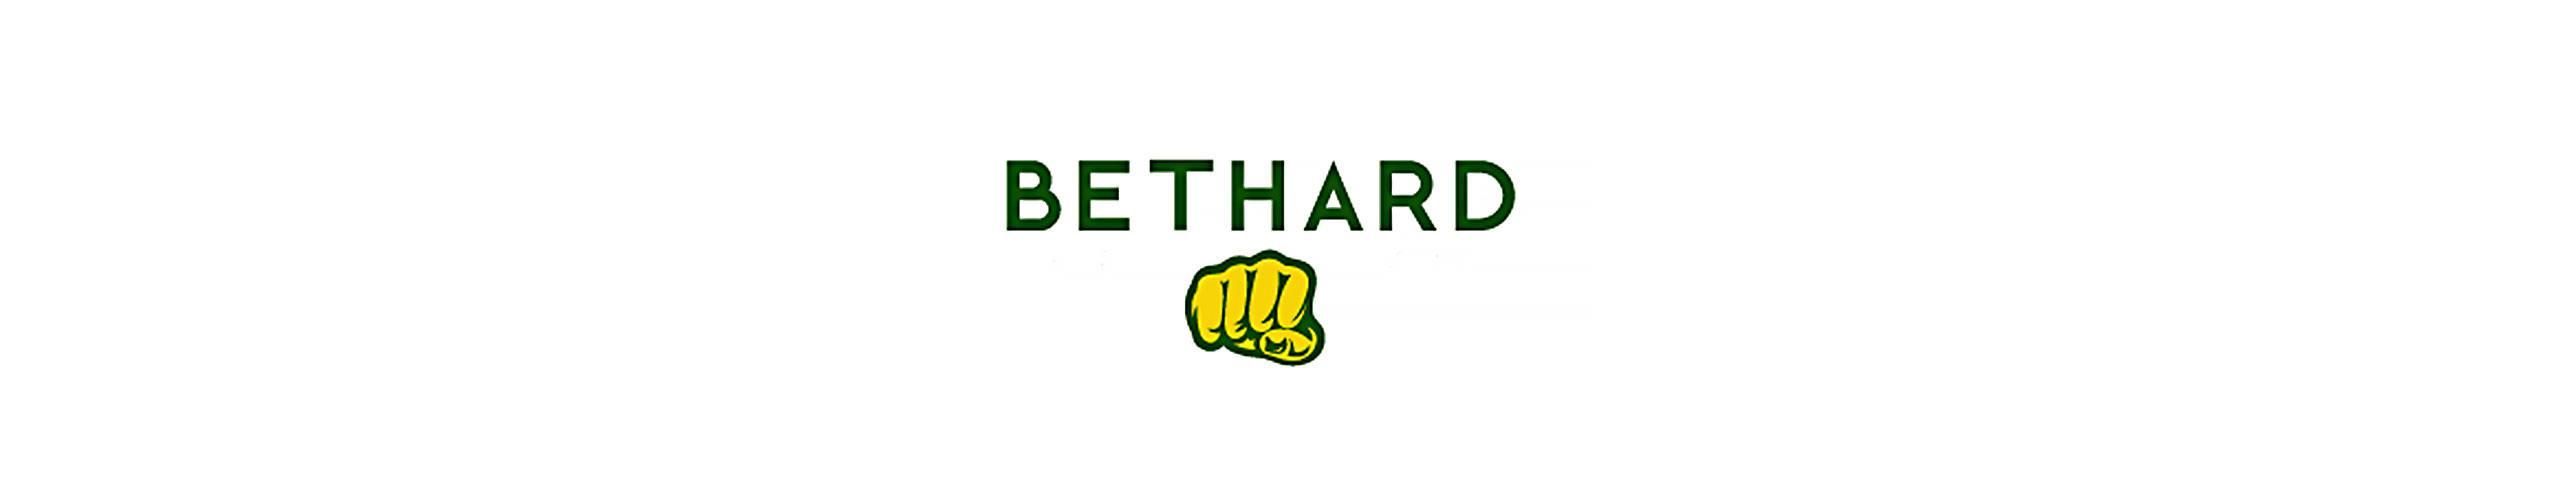 Gaming Bethard com bet365 tenis-585370